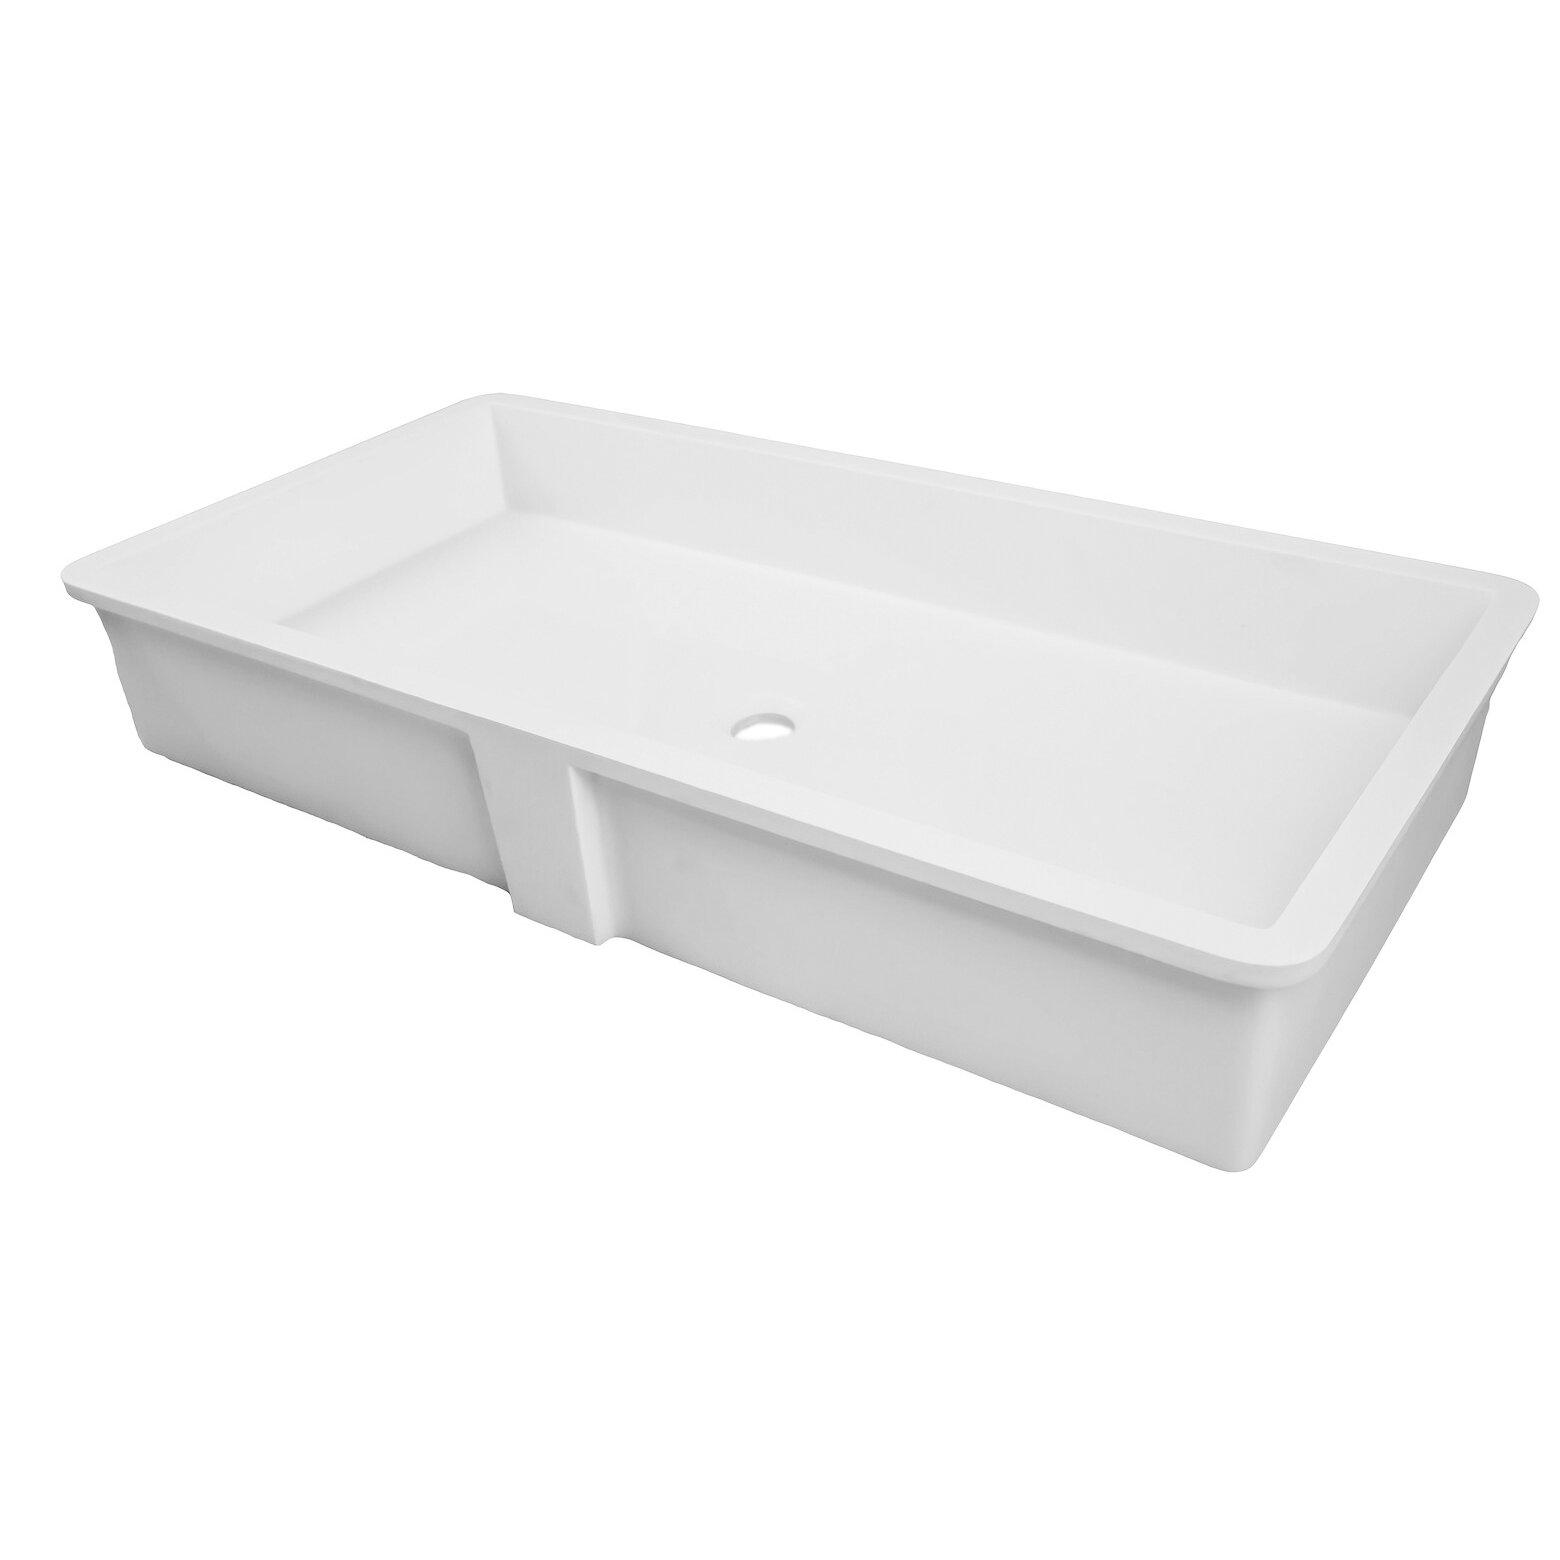 Decolav Solid Surface Rectangular Undermount Lavatory Sink